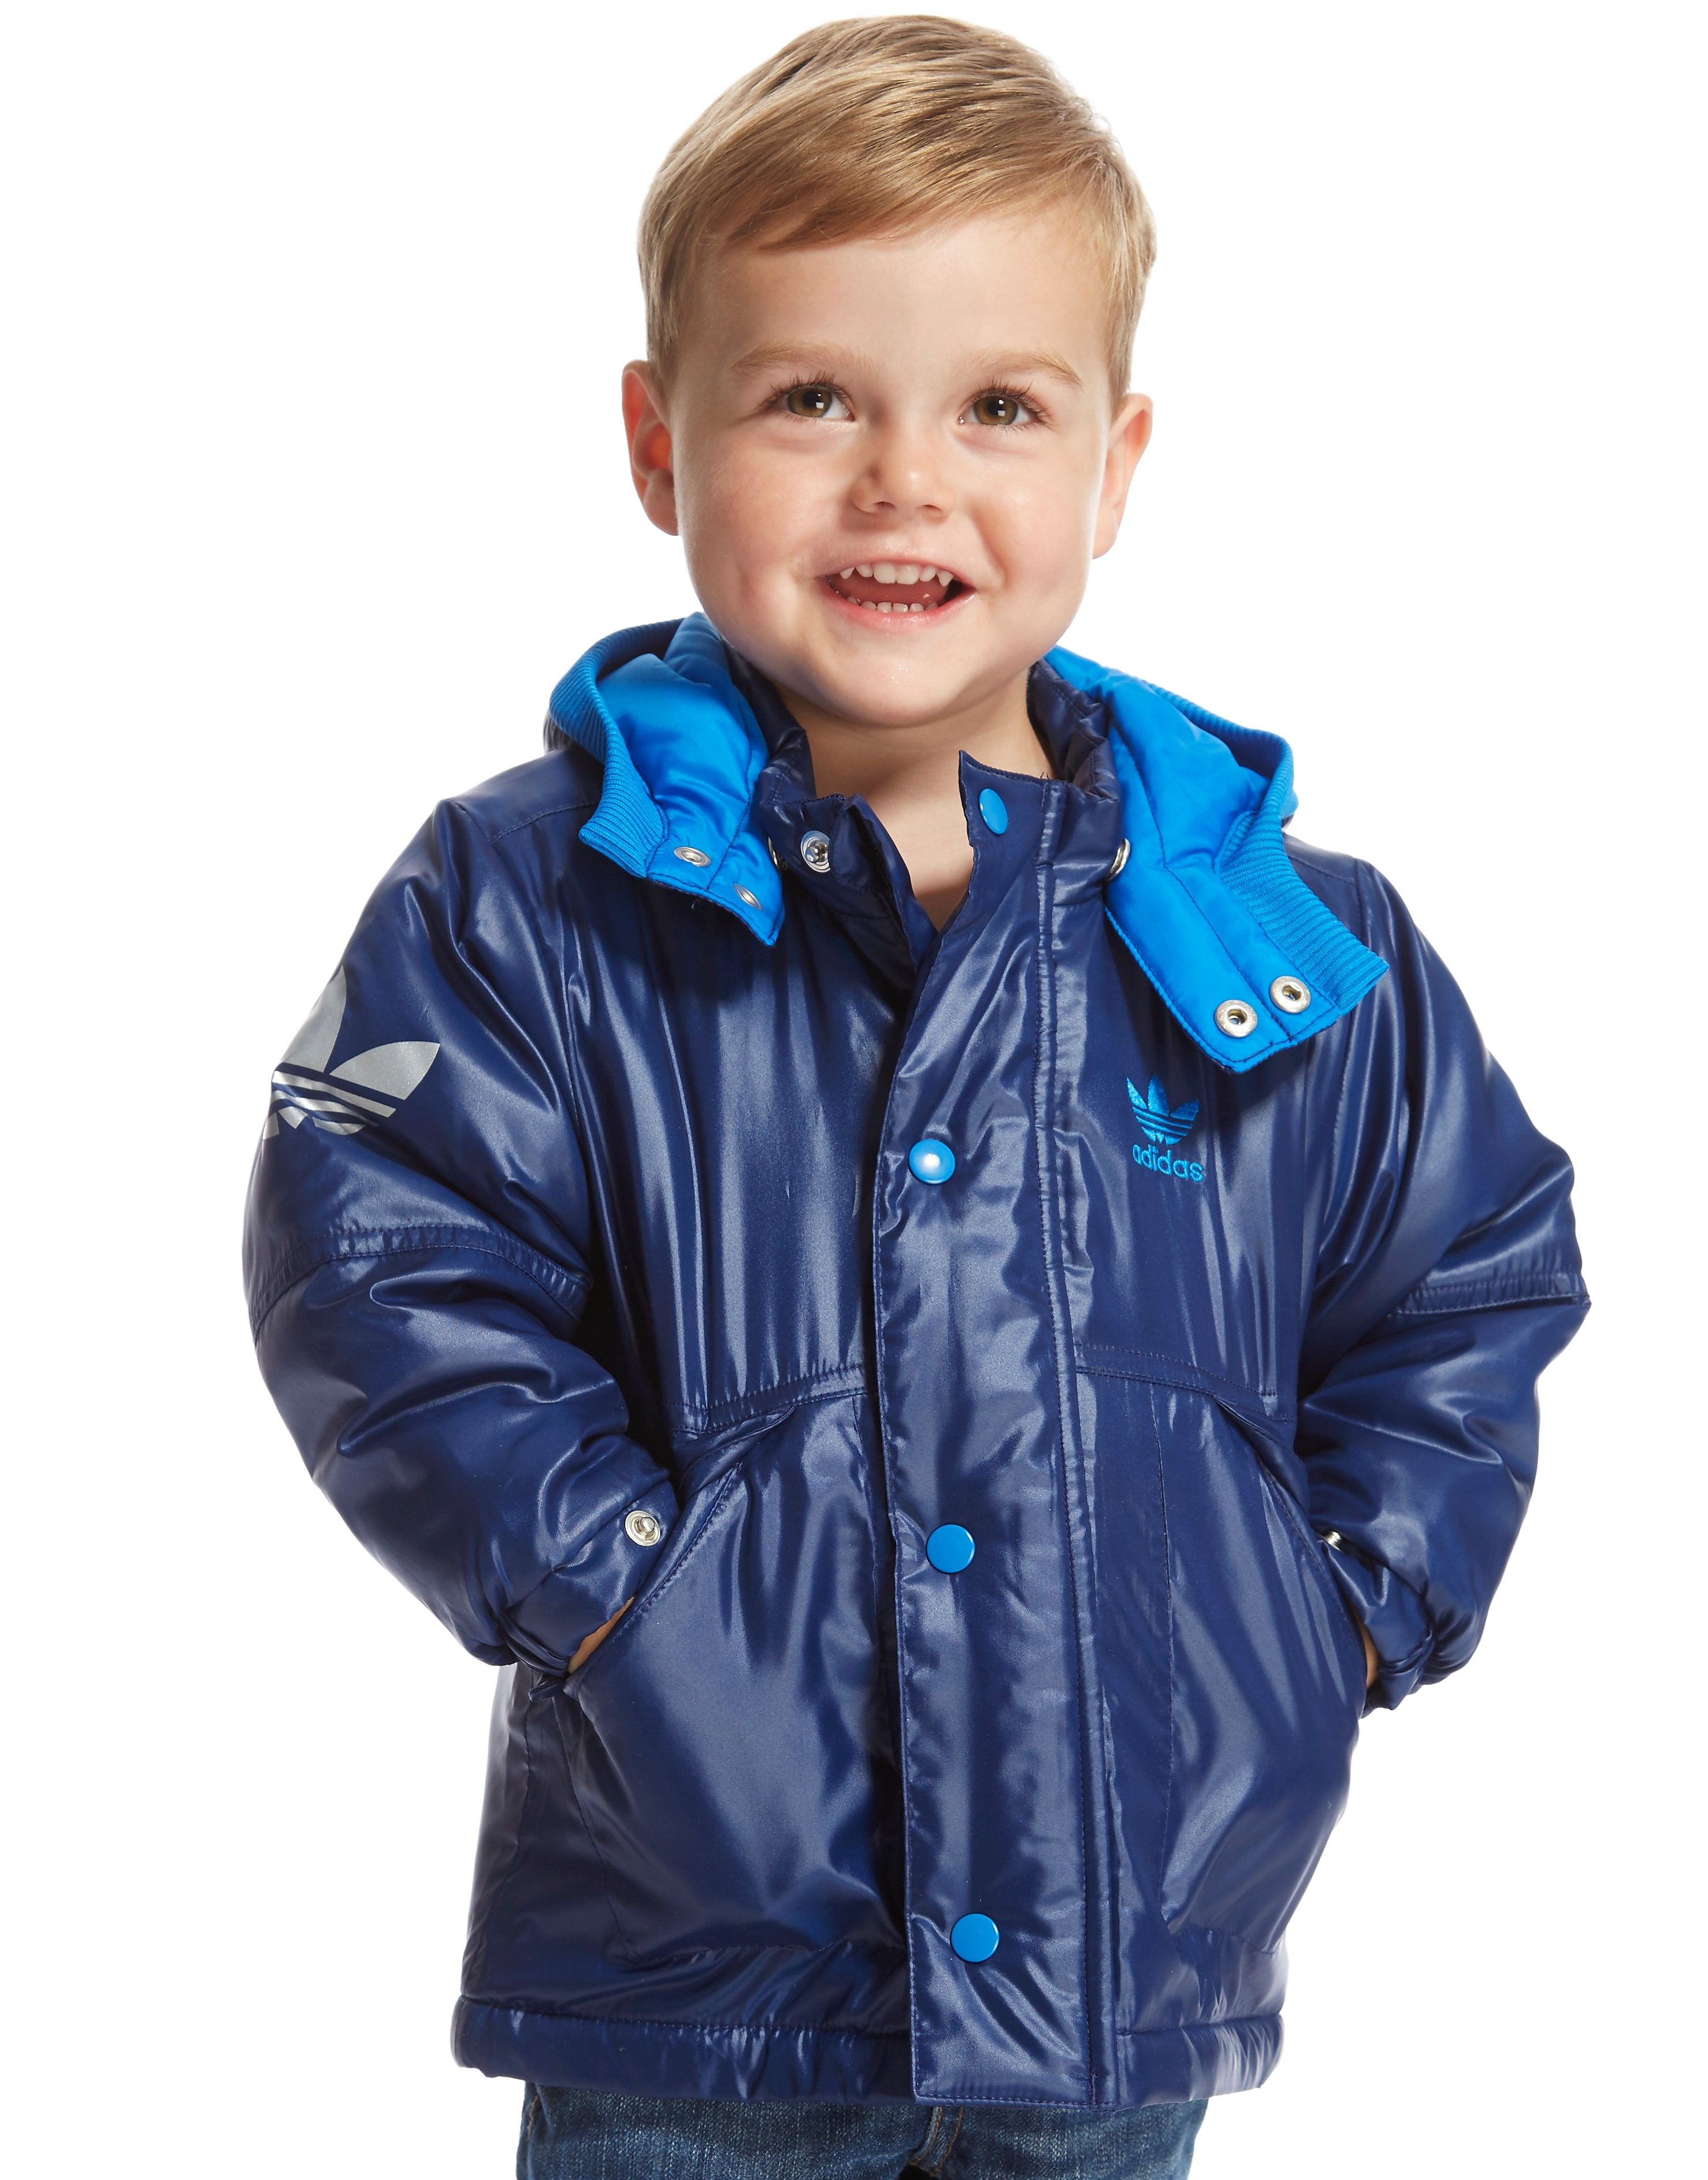 adidas Originals Parka Jacket Infant - Navy/Blue - Kids, Navy/Blue